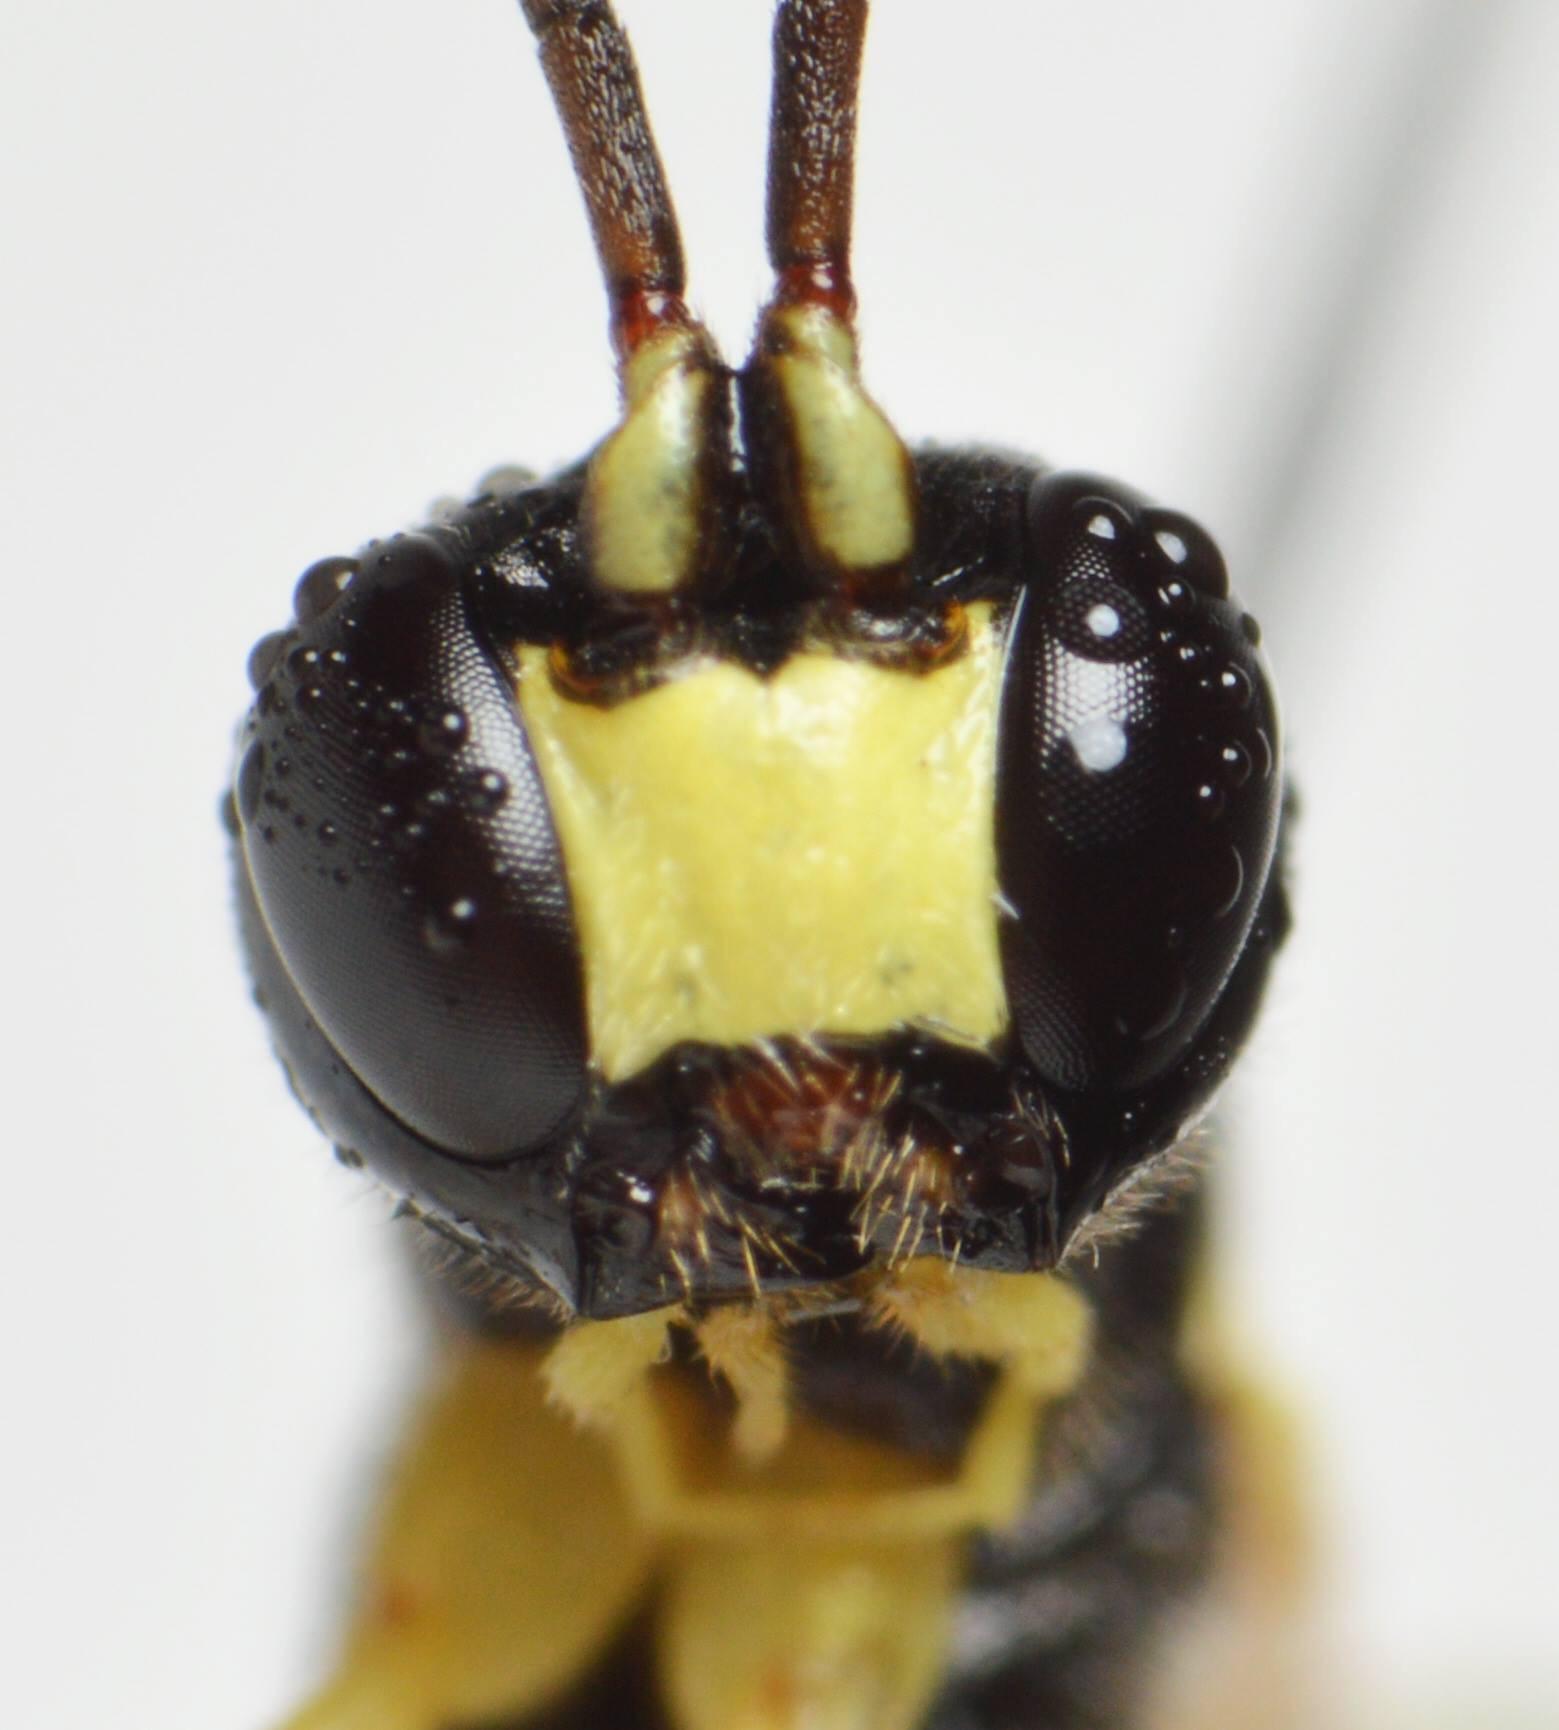 Pseudorhyssa nigricornis